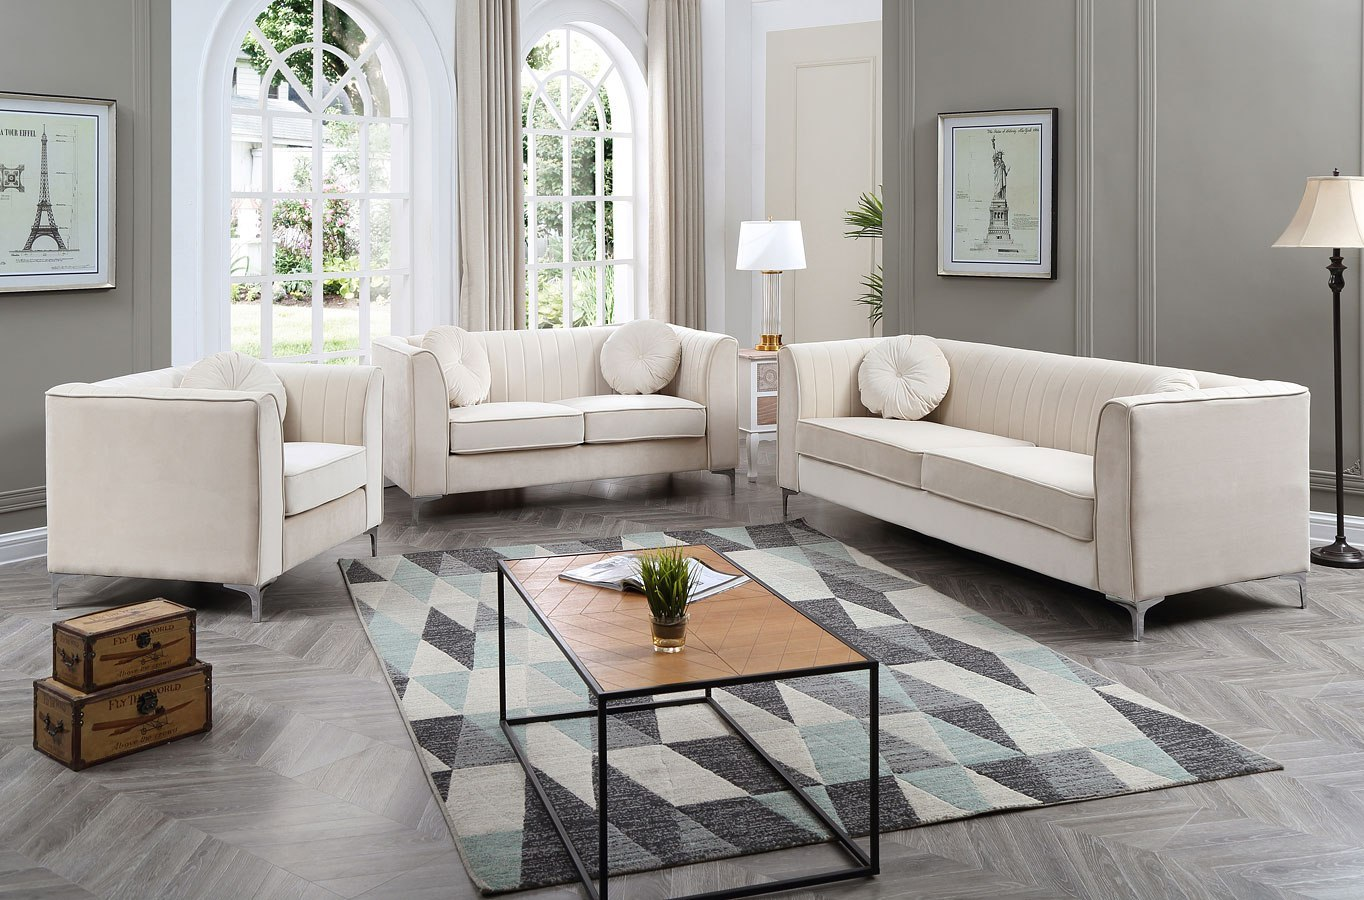 Delray Living Room Set (Ivory)